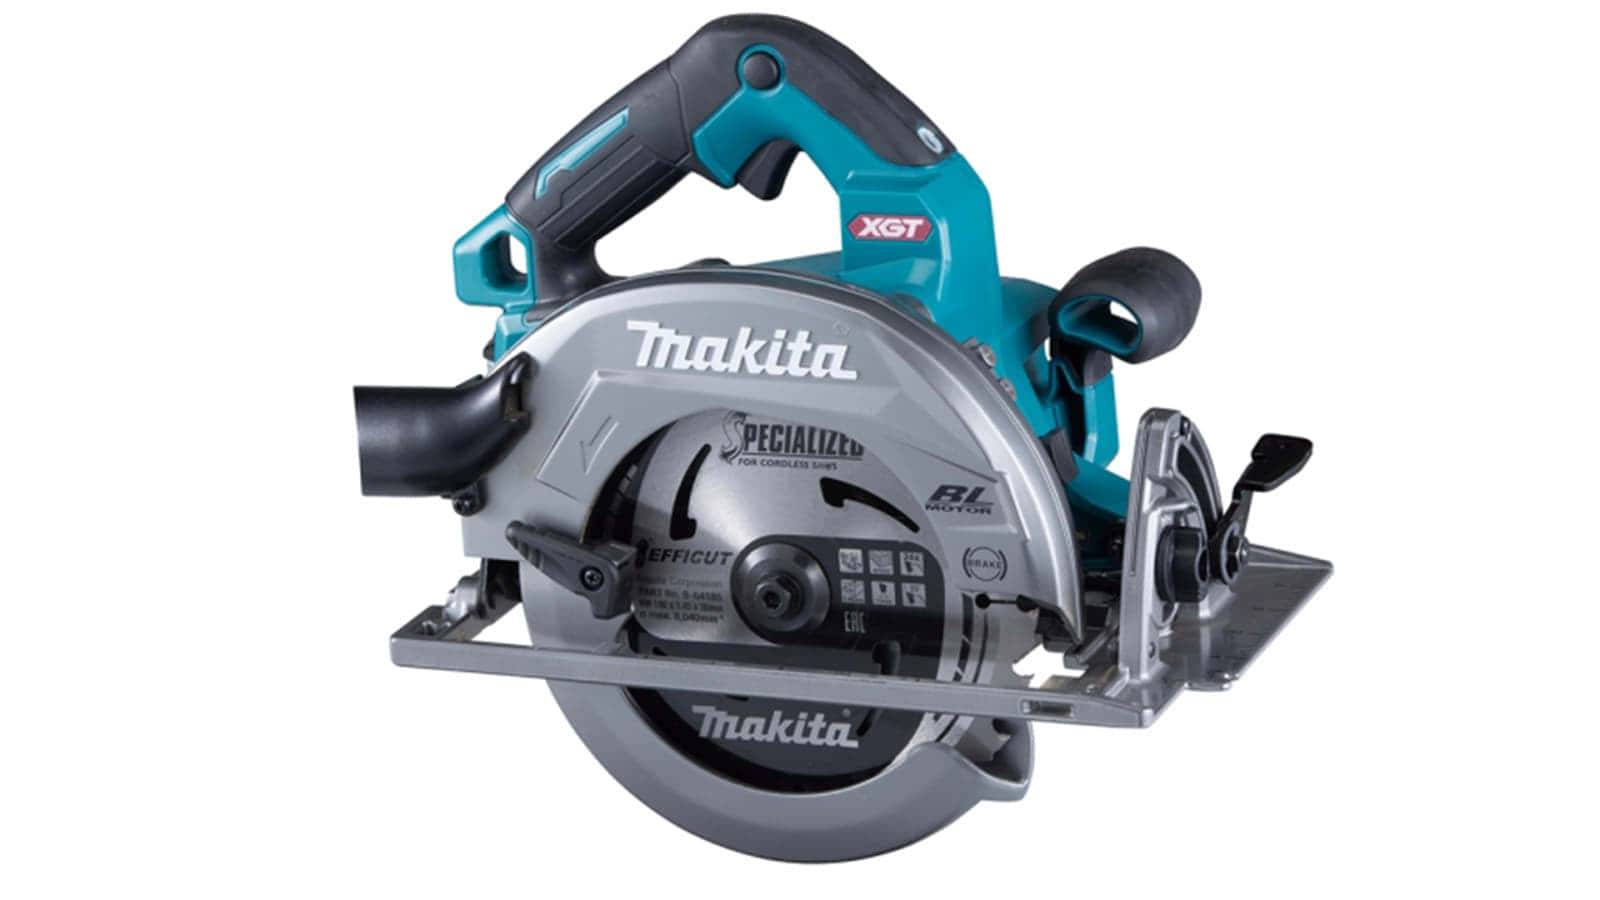 Makita HS003G 40V MAX充電式190mmチップソー搭載丸ノコを発売